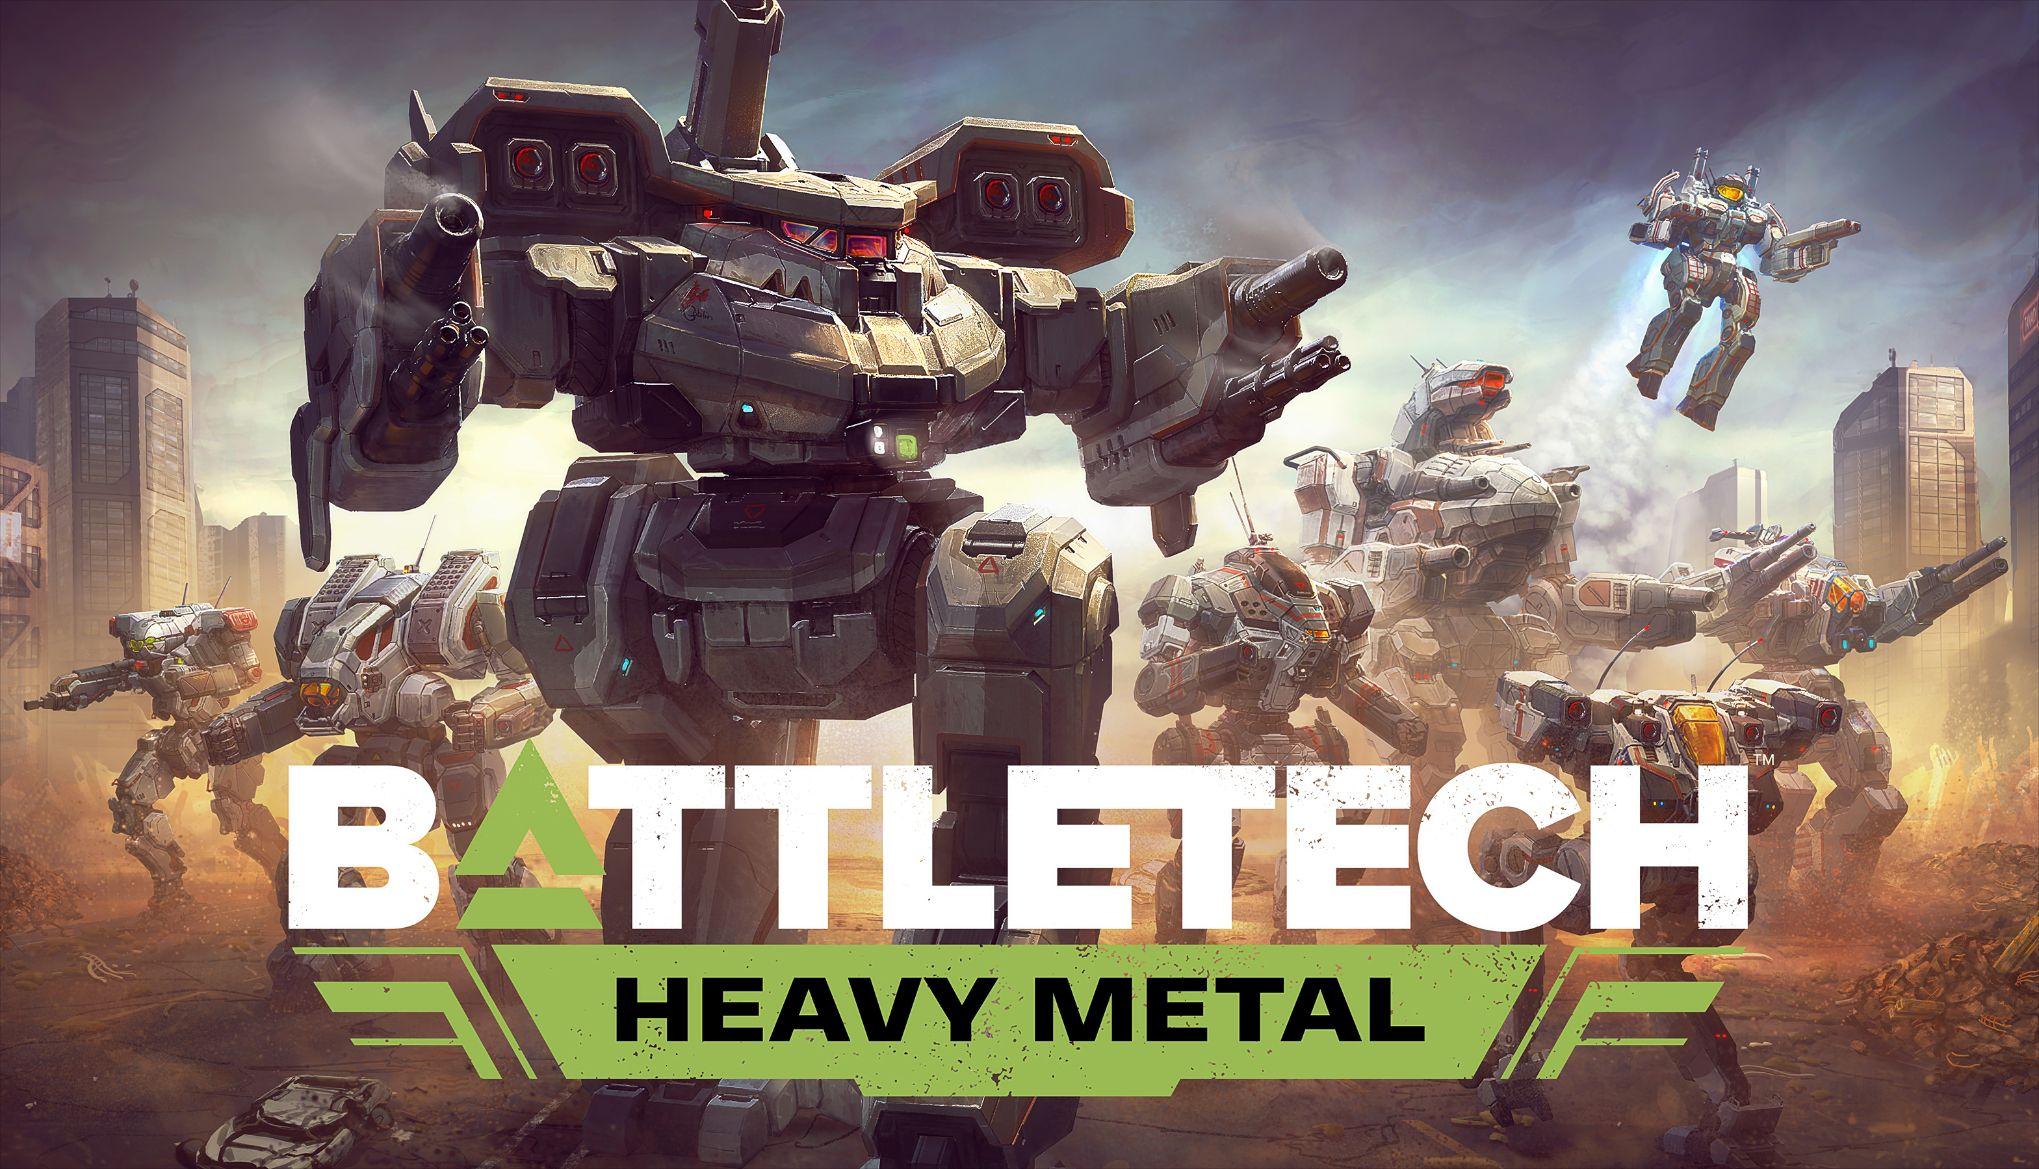 BATTLETECH - Heavy Metal | ROW (6d16f2d4-a66b-4476-bf08-22539dc0ae36)